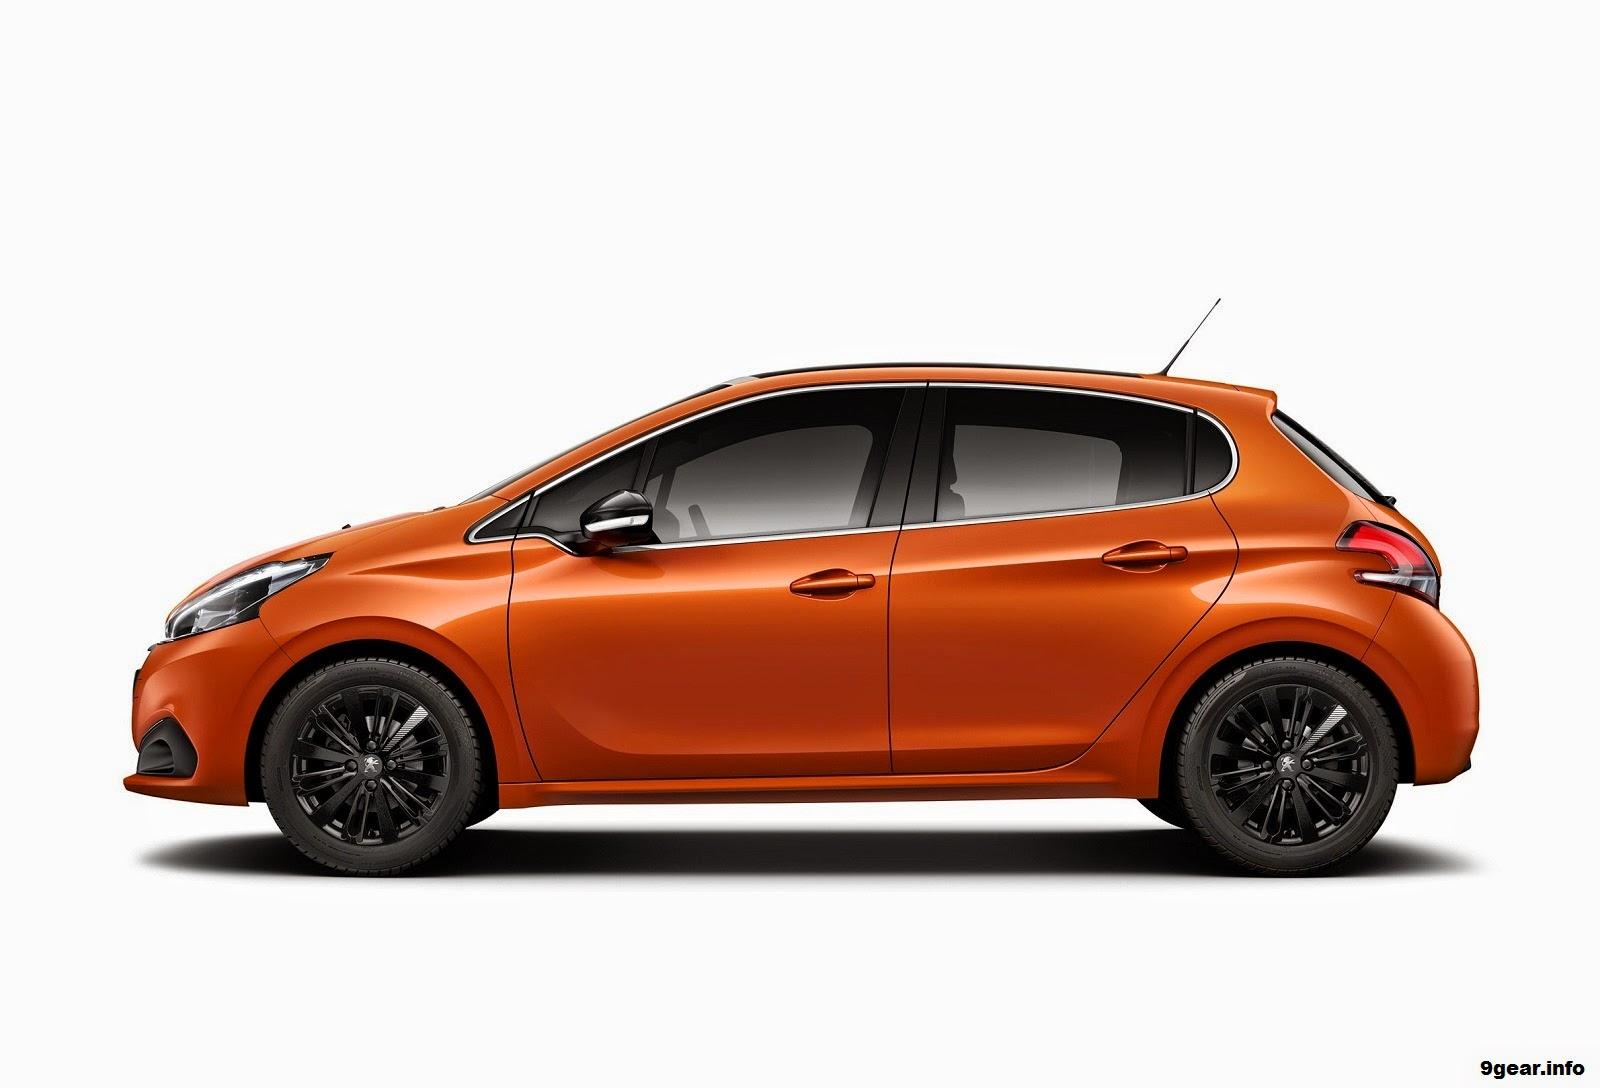 peugeot 208 gets 2015 updates and a 94mpg diesel car reviews new car pictures for 2018 2019. Black Bedroom Furniture Sets. Home Design Ideas